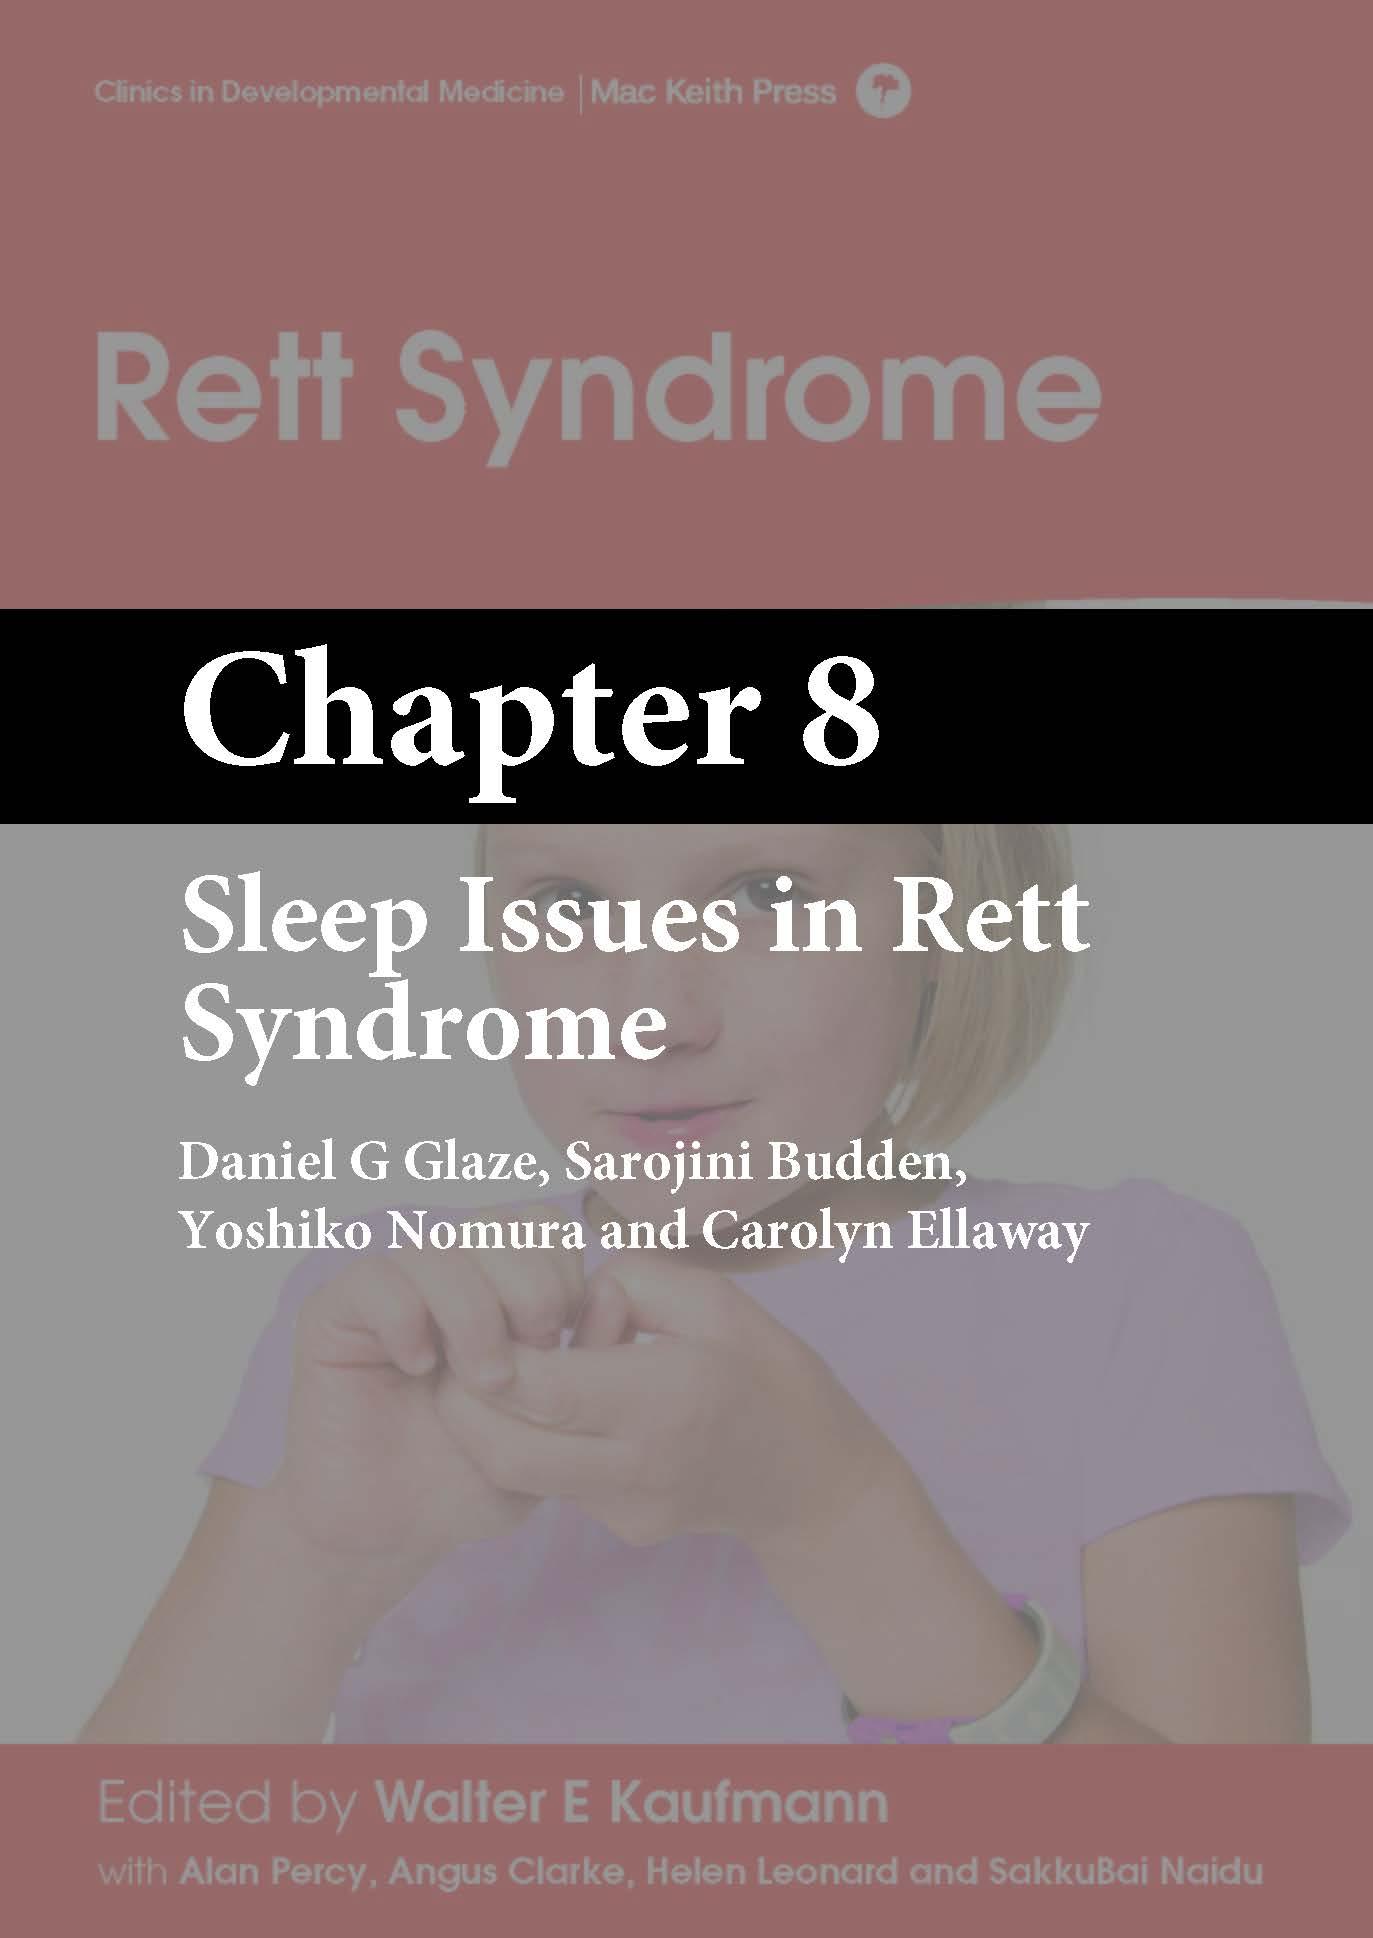 Rett Syndrome, Kaufmann, Chapter 8 cover